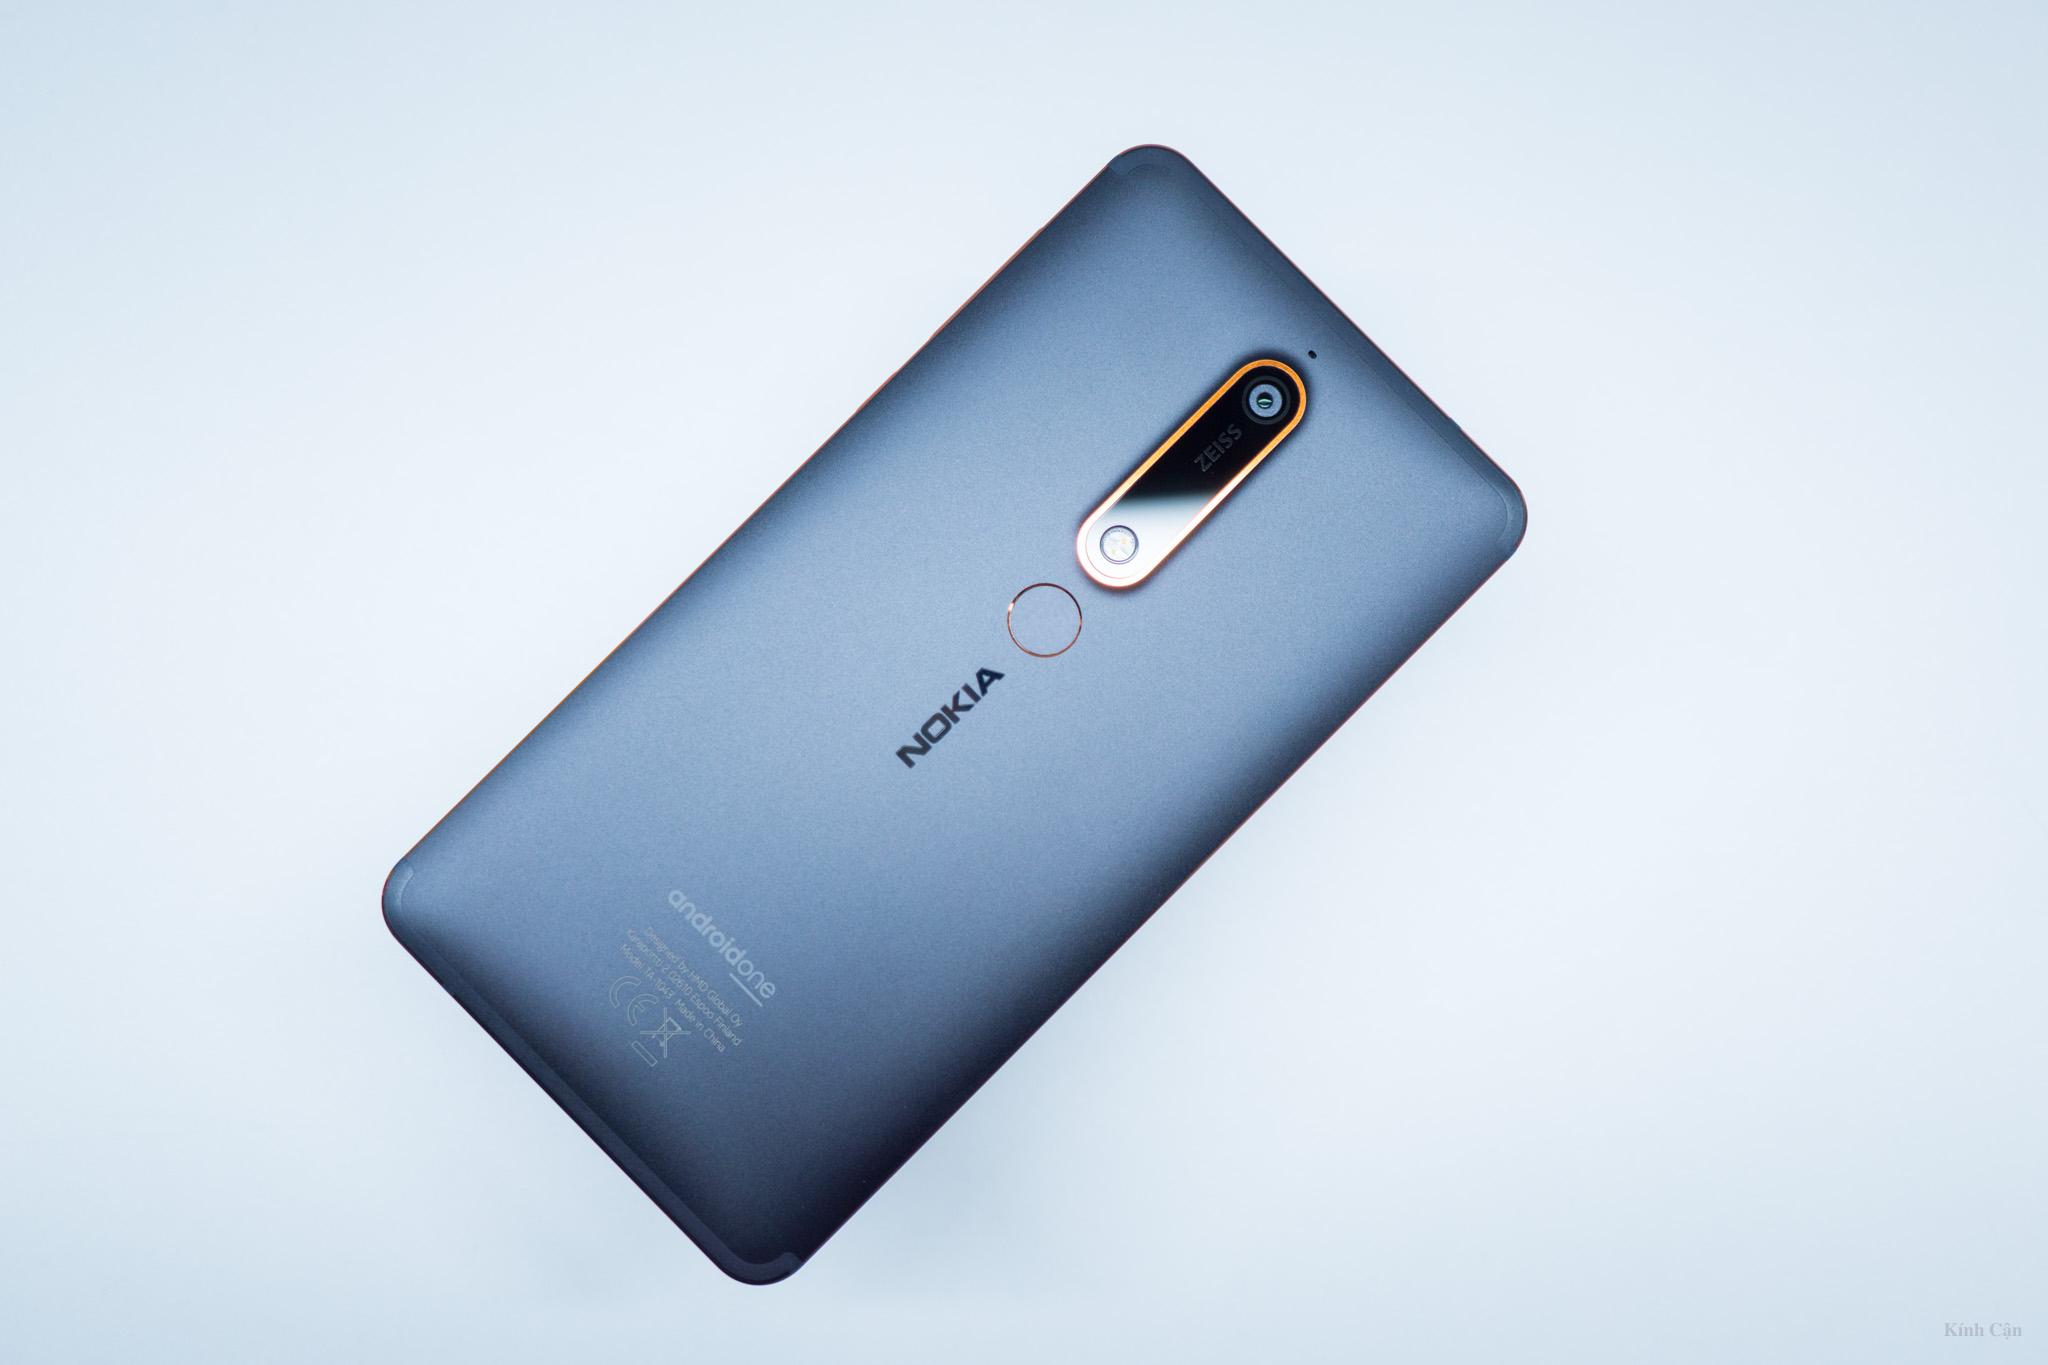 Nokia 6 mới_-13.jpg